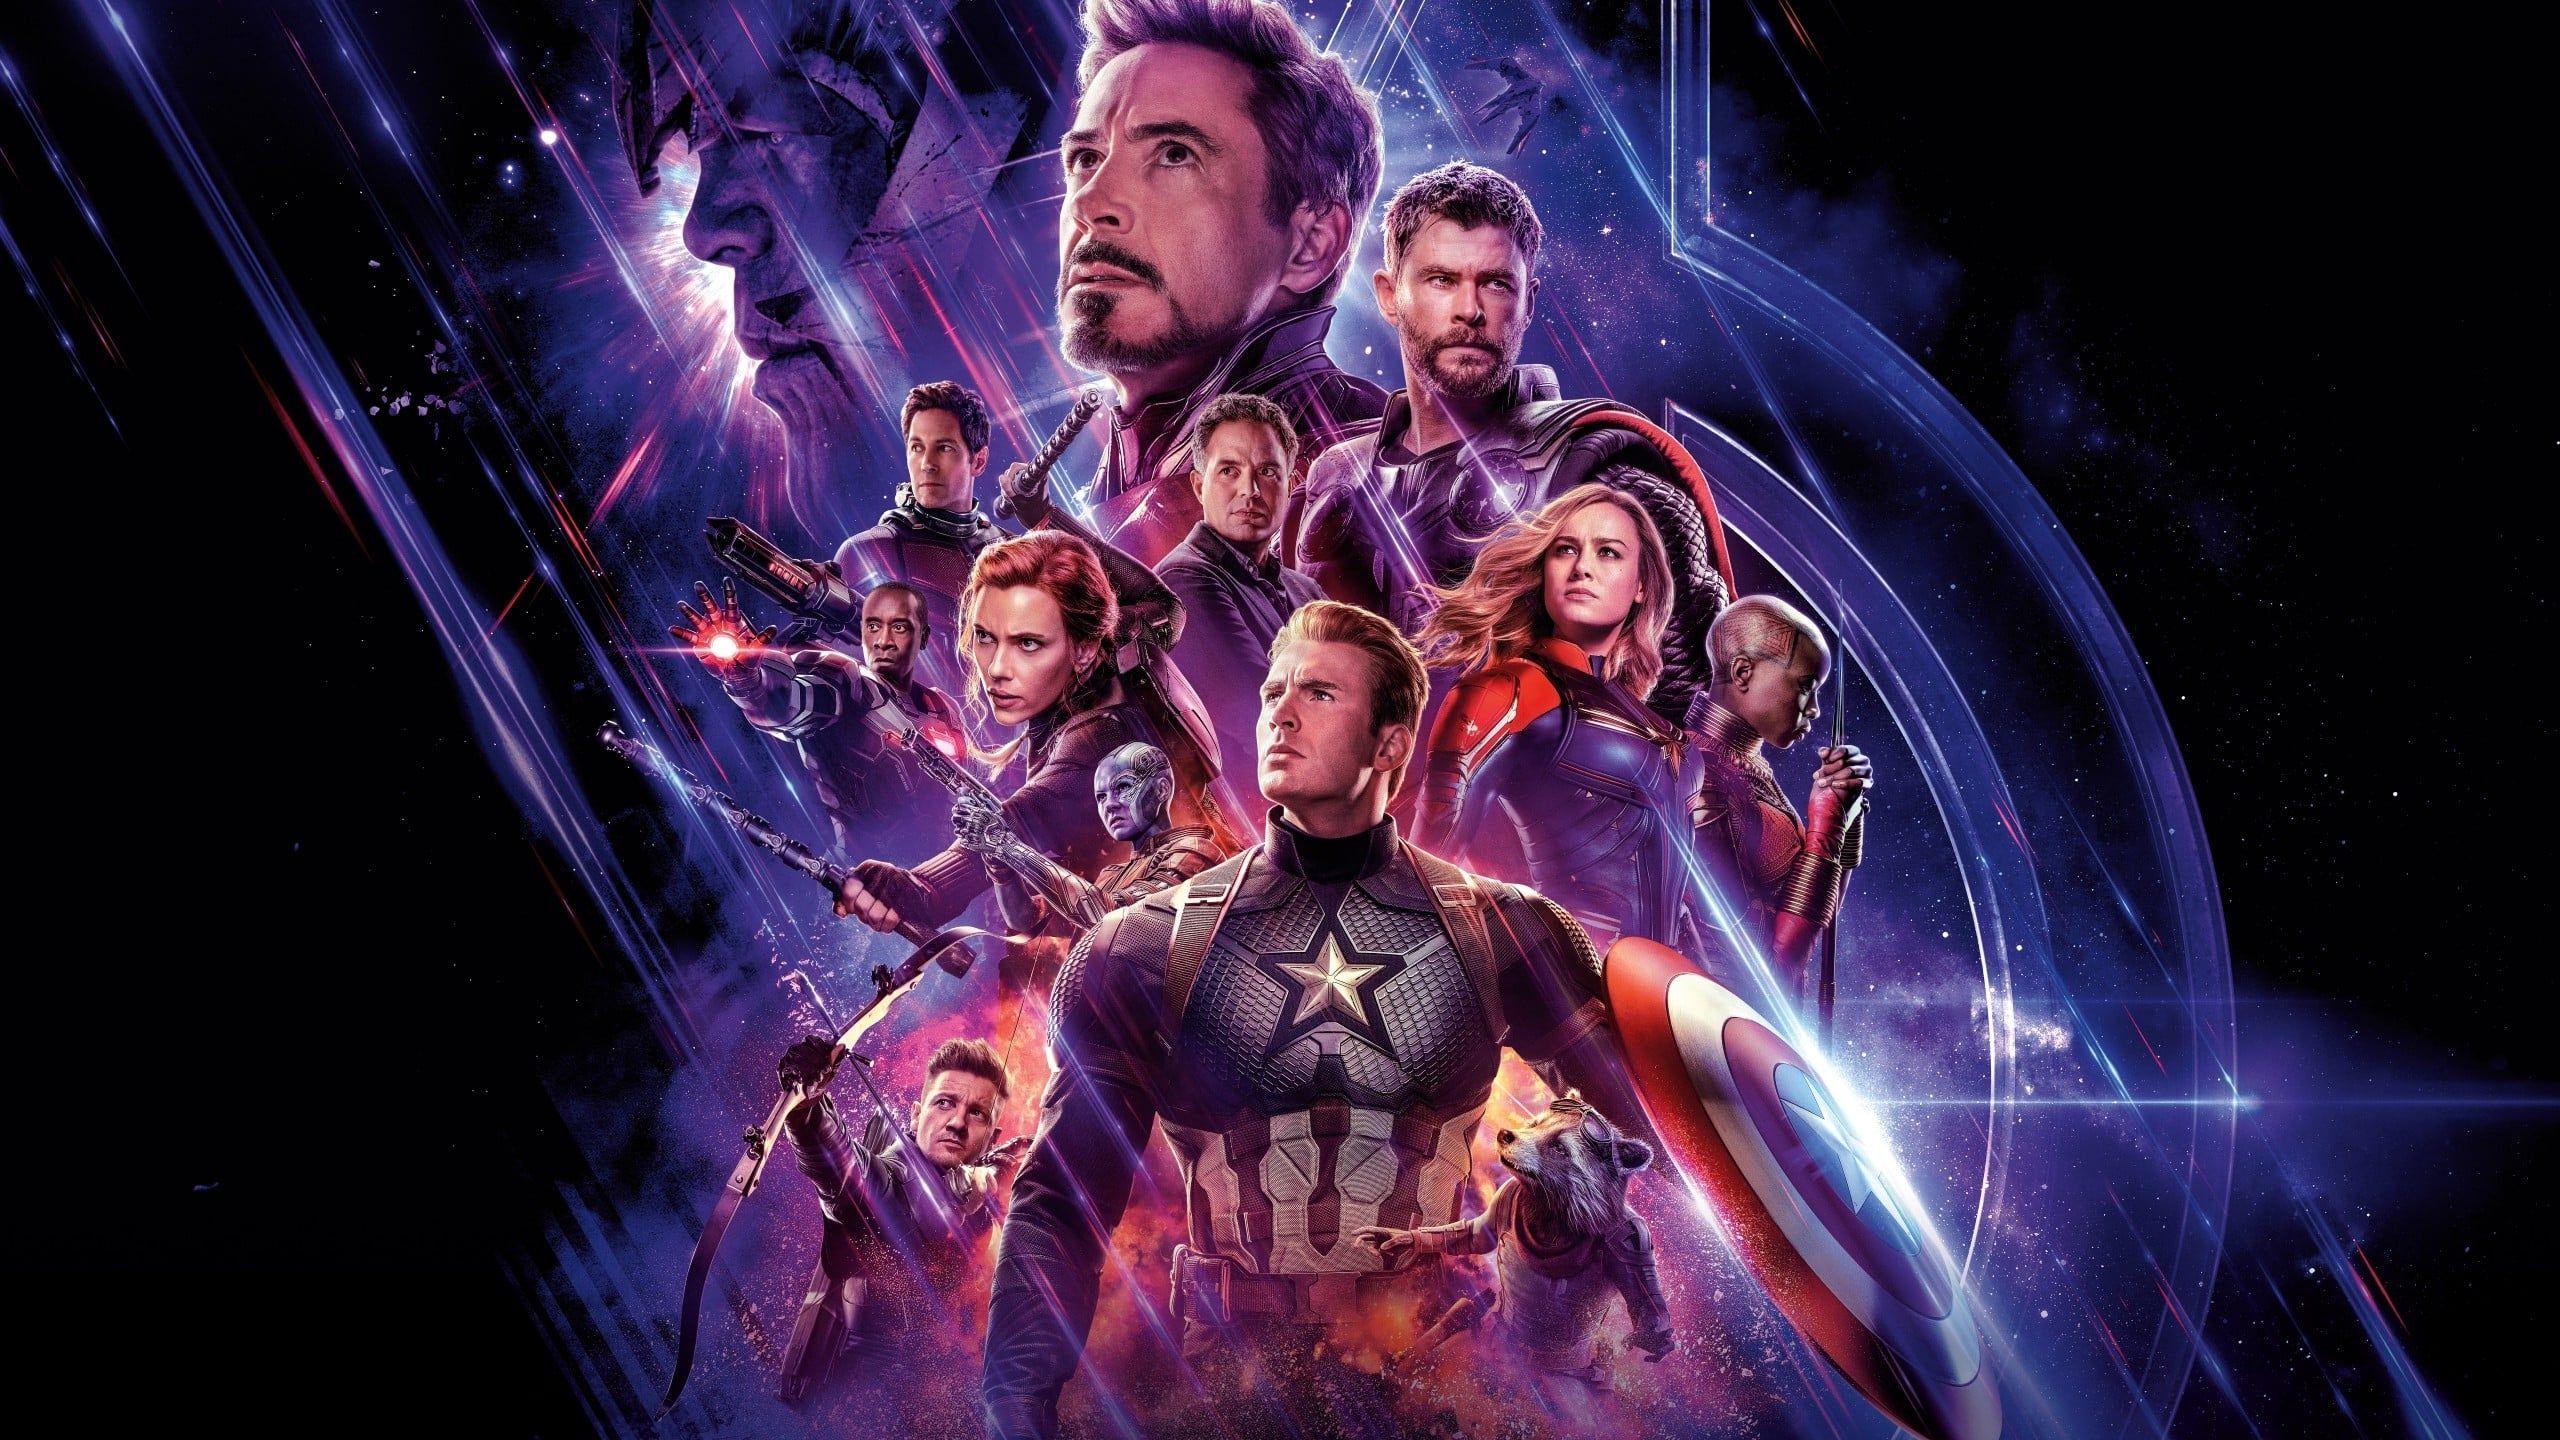 Avengers End Game Razbunatorii Sfarsitul Jocului Online Subtitrat In Romana Hd Avengers Wallpaper Marvel Wallpaper Thor Wallpaper